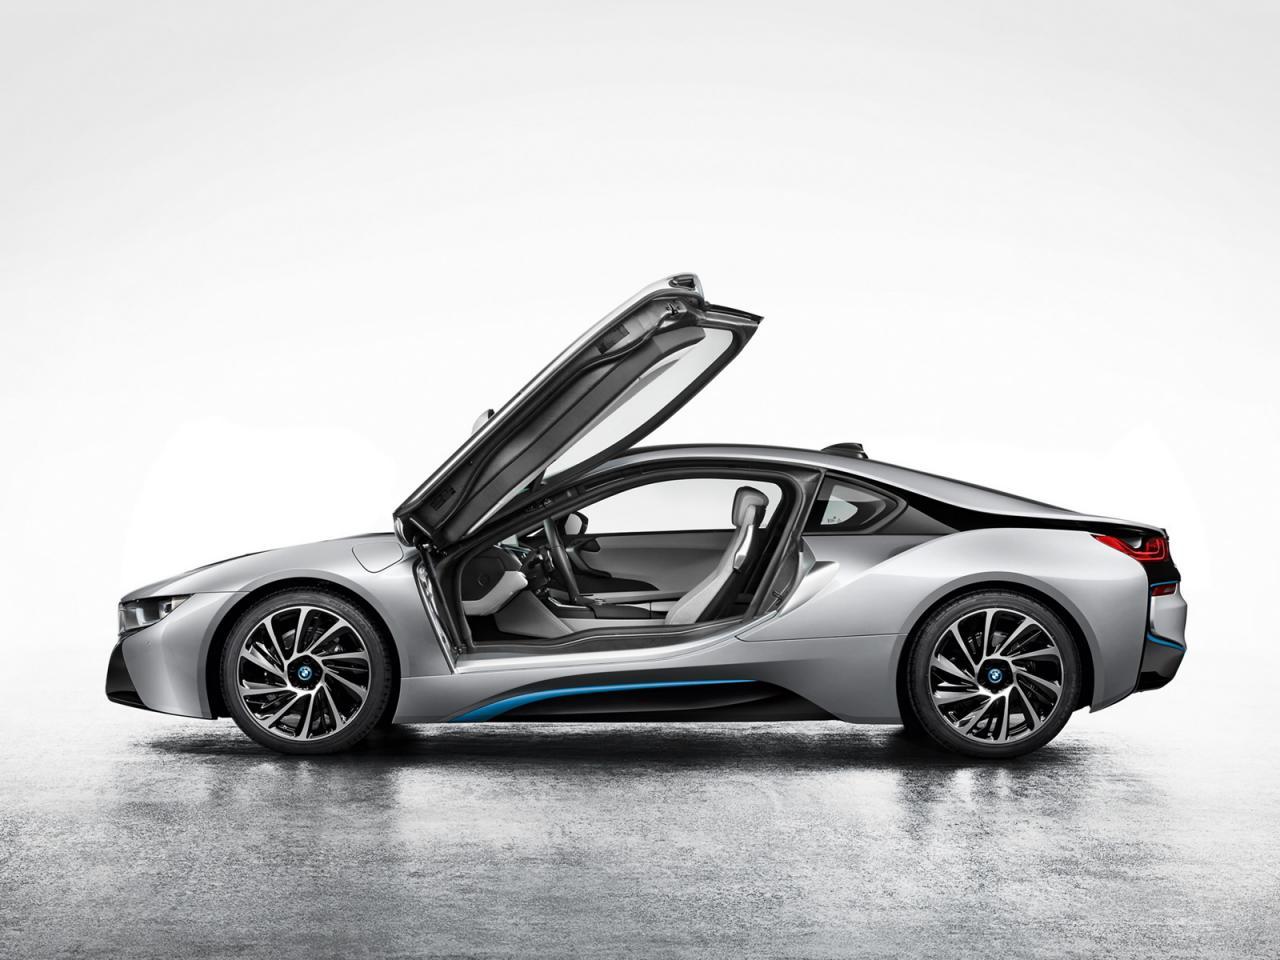 2014 BMW i8 leaked